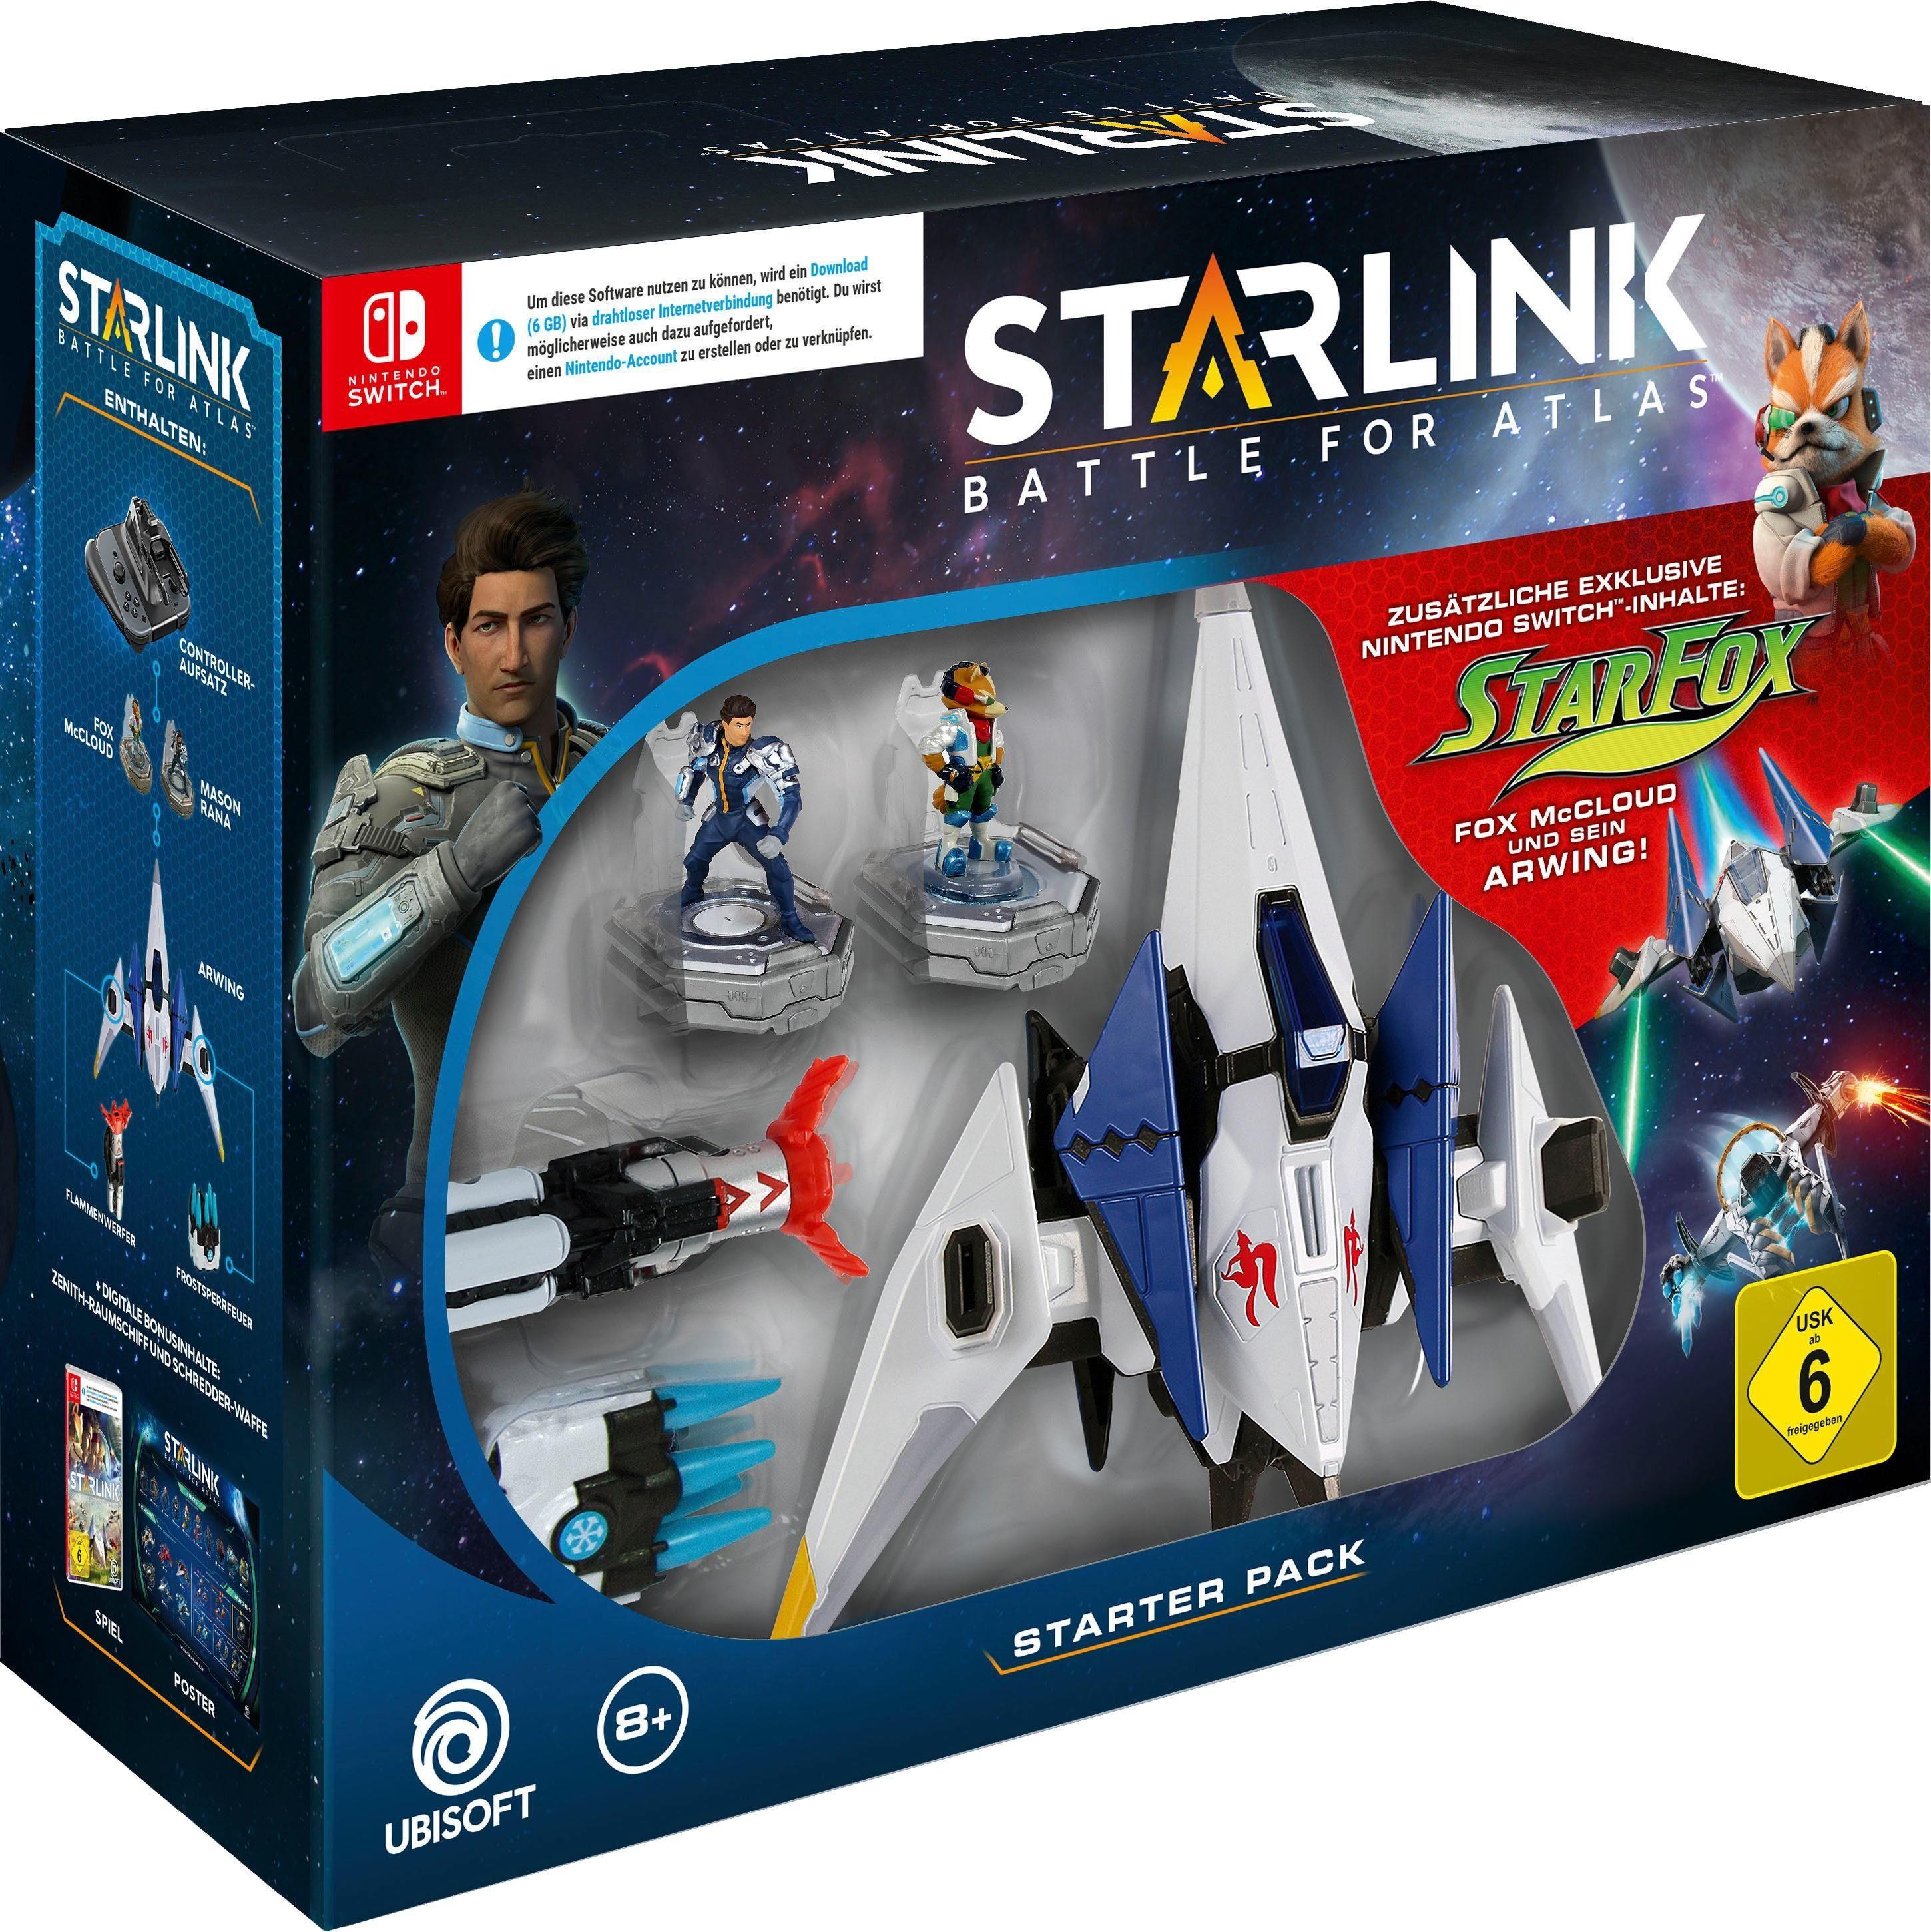 Starlink Starter Pack Nintendo Switch